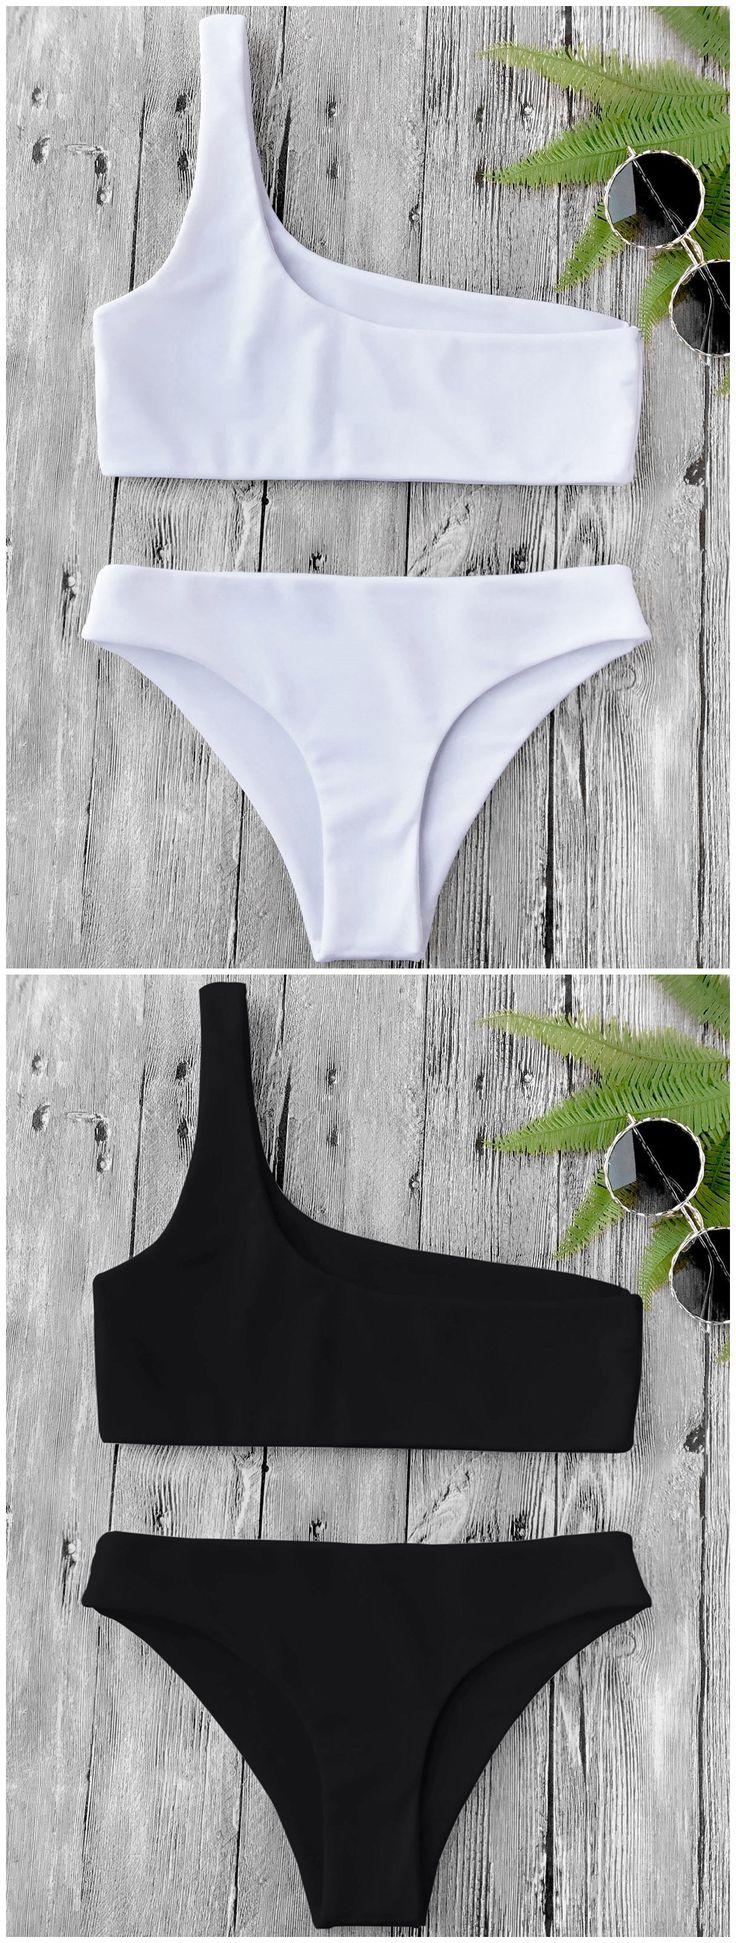 Up to 80% OFF!  One Shoulder Bikini Set. #Zaful #swimwear Zaful, zaful bikinis, zaful dress, zaful swimwear, fashion, style, outfits, women fashion, summer outfits, swimwear, bikinis, micro bikini, high waisted bikini, halter bikini, crochet bikini, one piece swimwear, tankini, bikini set, cover ups, bathing suit, swimsuits, summer fashion, summer outfits, Christmas, ugly Christmas, Thanksgiving, gift, Christmas hoodies, Black Friday, Cyber Monday @zaful Extra 10% OFF Code:ZF2017